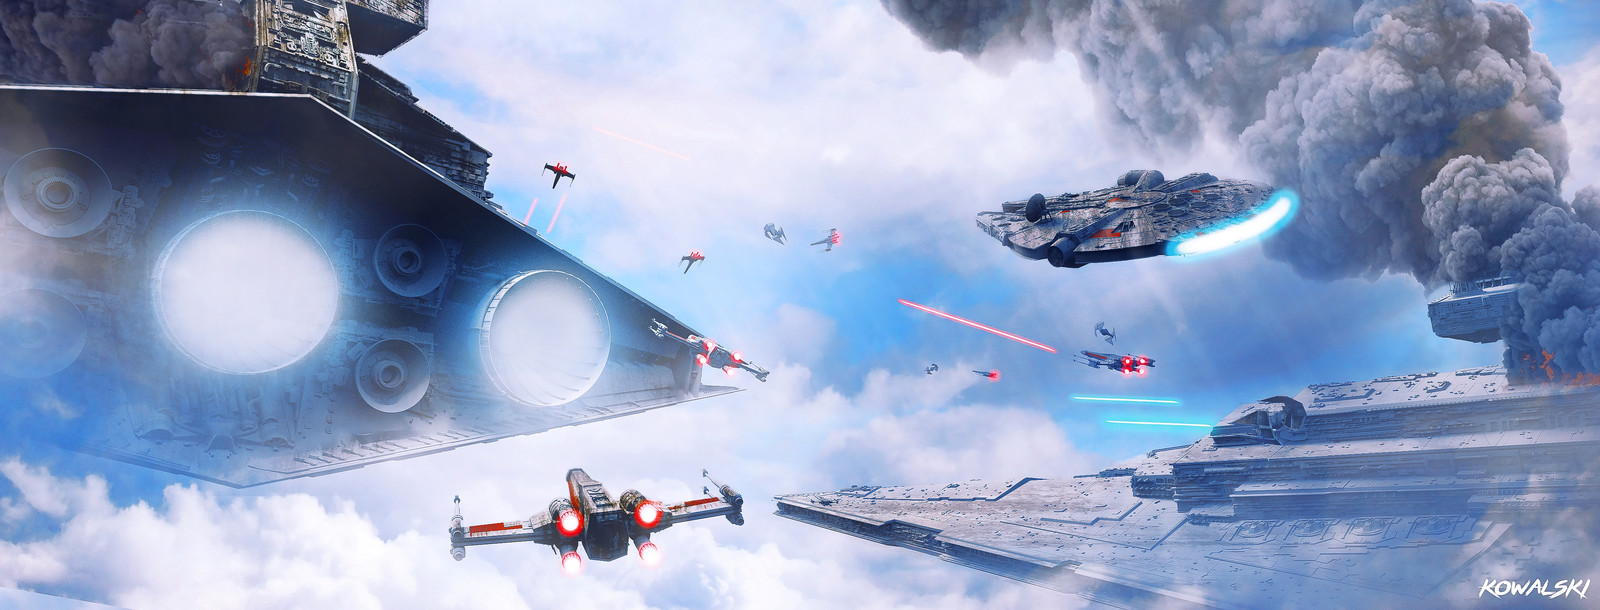 Star Wars - Epic space Battle